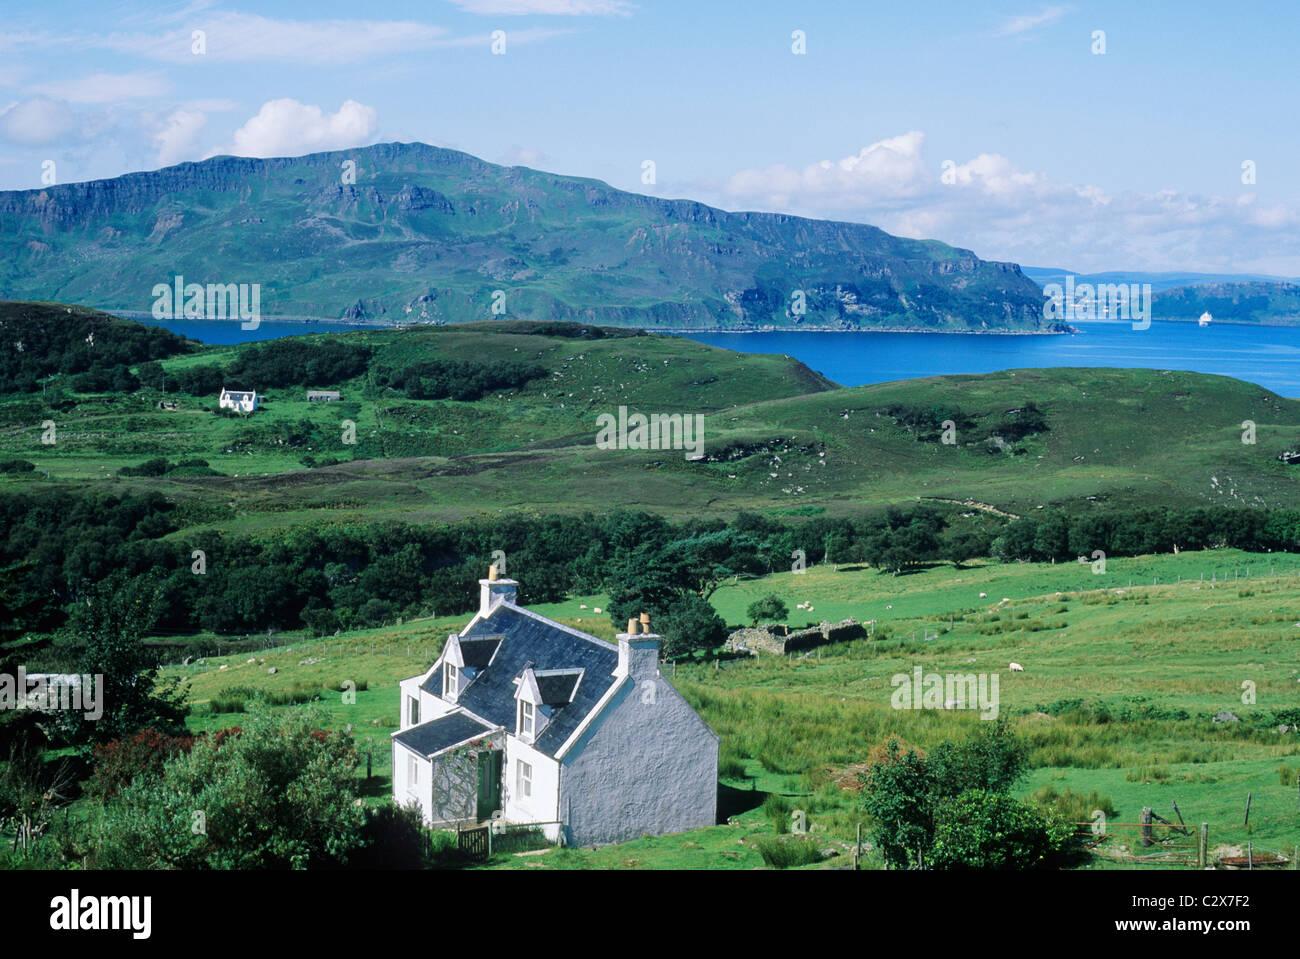 Isle of Raasay, view over Balachuirn Hamlet to Skye, Scotland Scottish island islands coast coastal scenery landscape - Stock Image